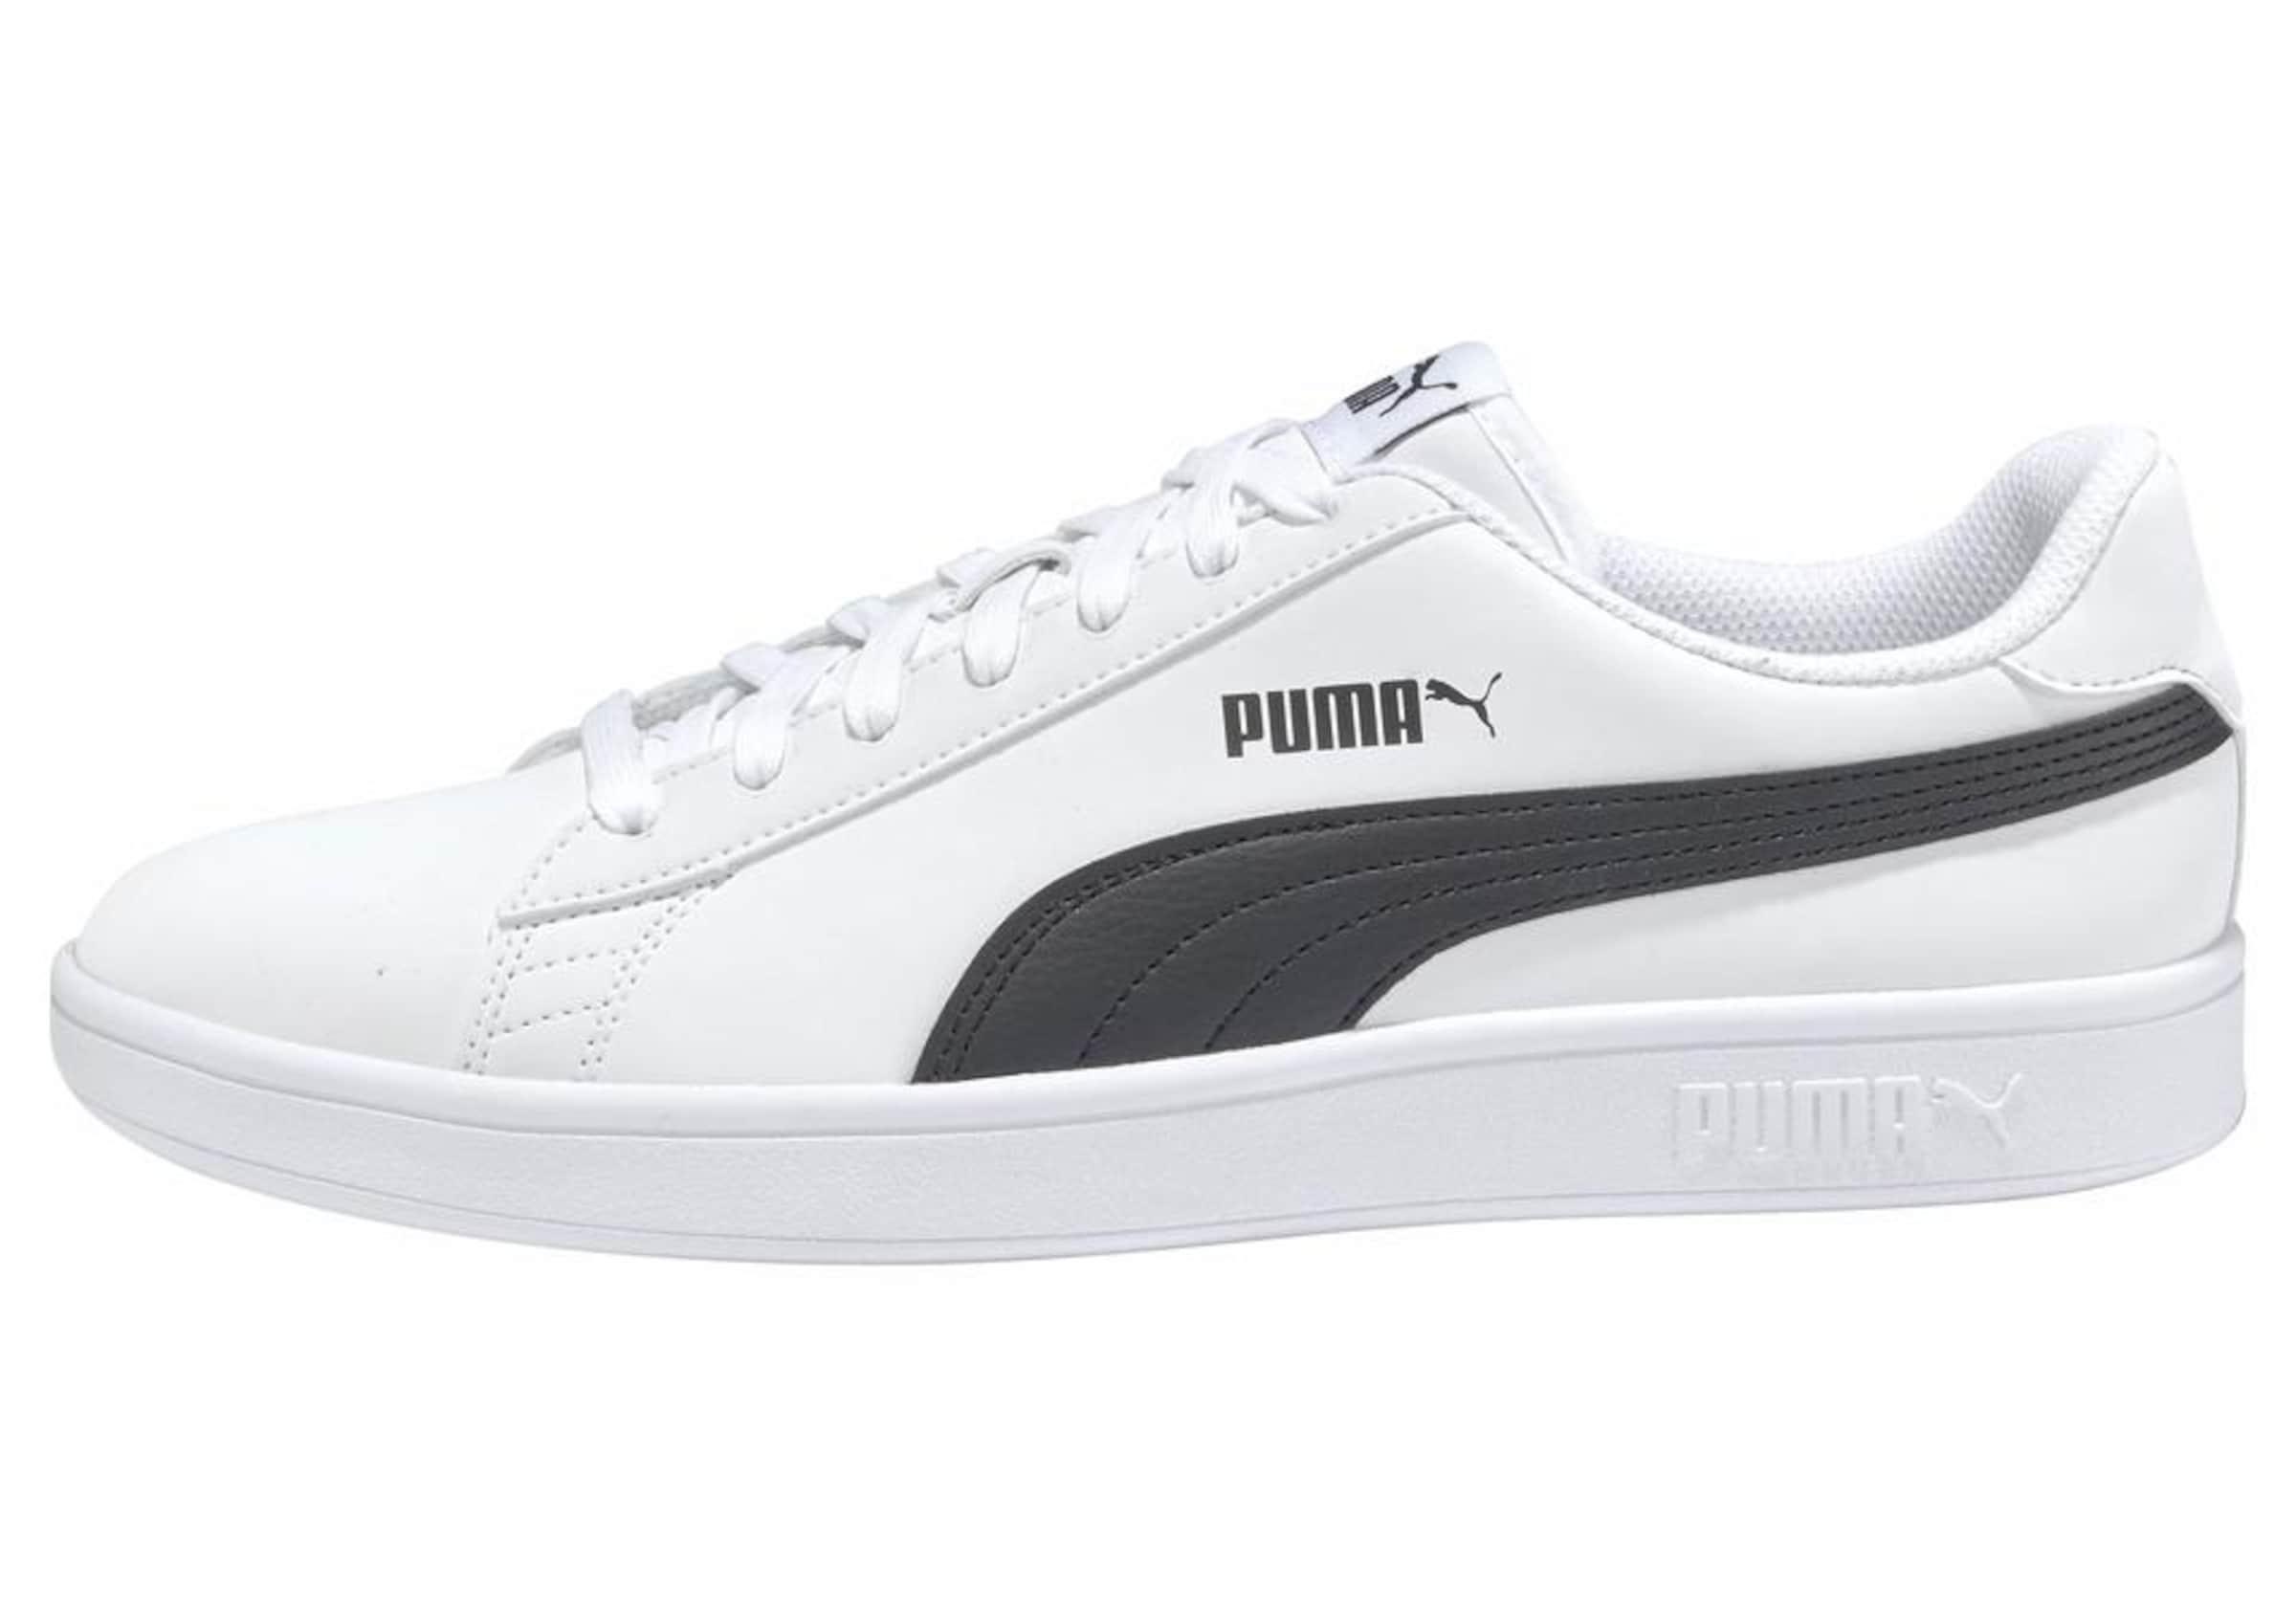 Buck' In SchwarzWeiß Sneaker V2 Puma 'smash rdCoWEQxeB